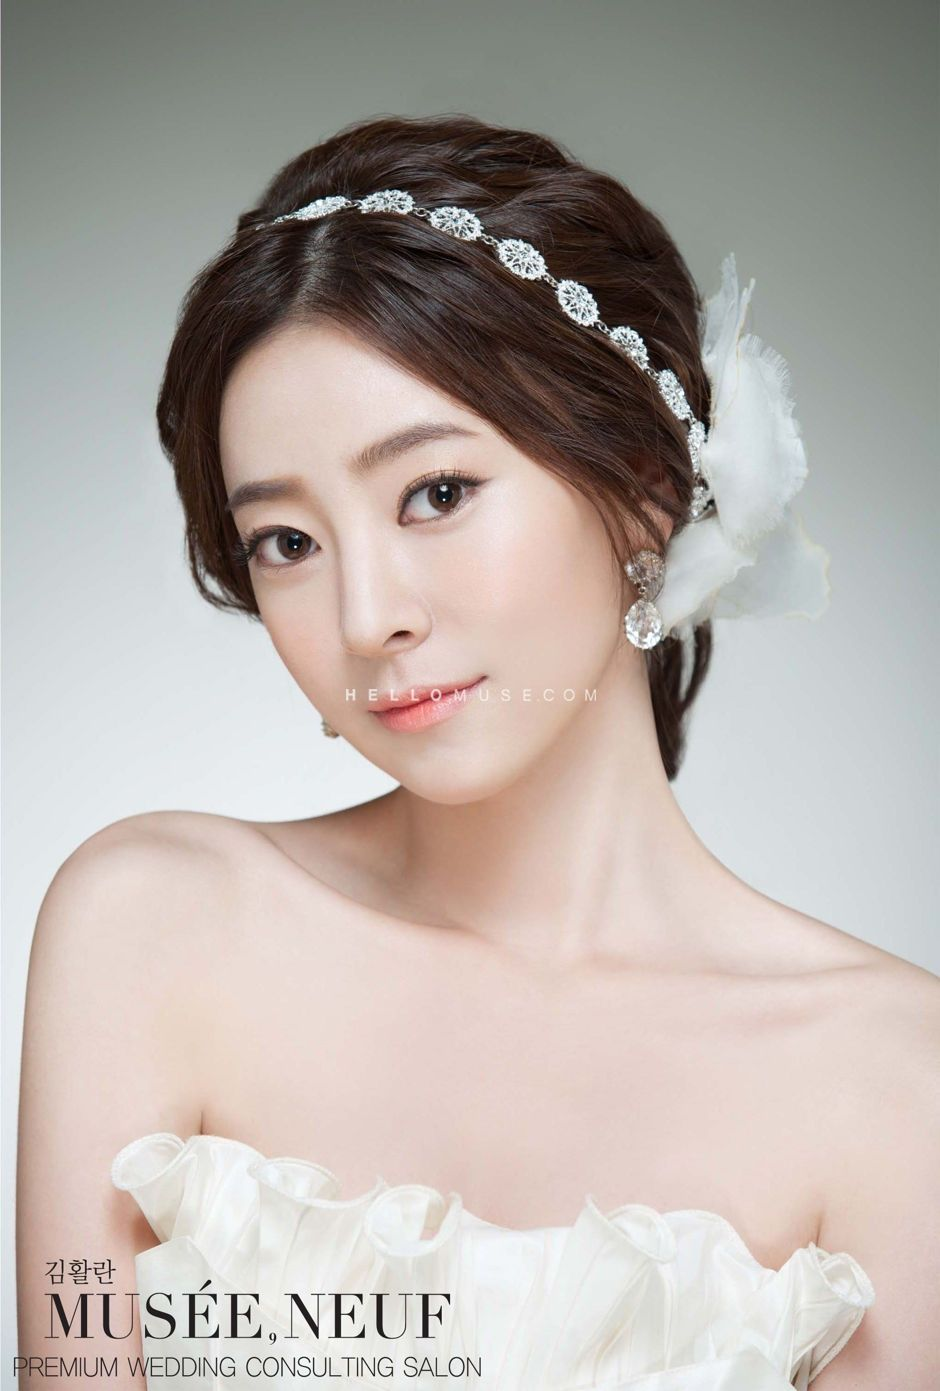 korea celebrity make up salon, korea start make up shop, korea